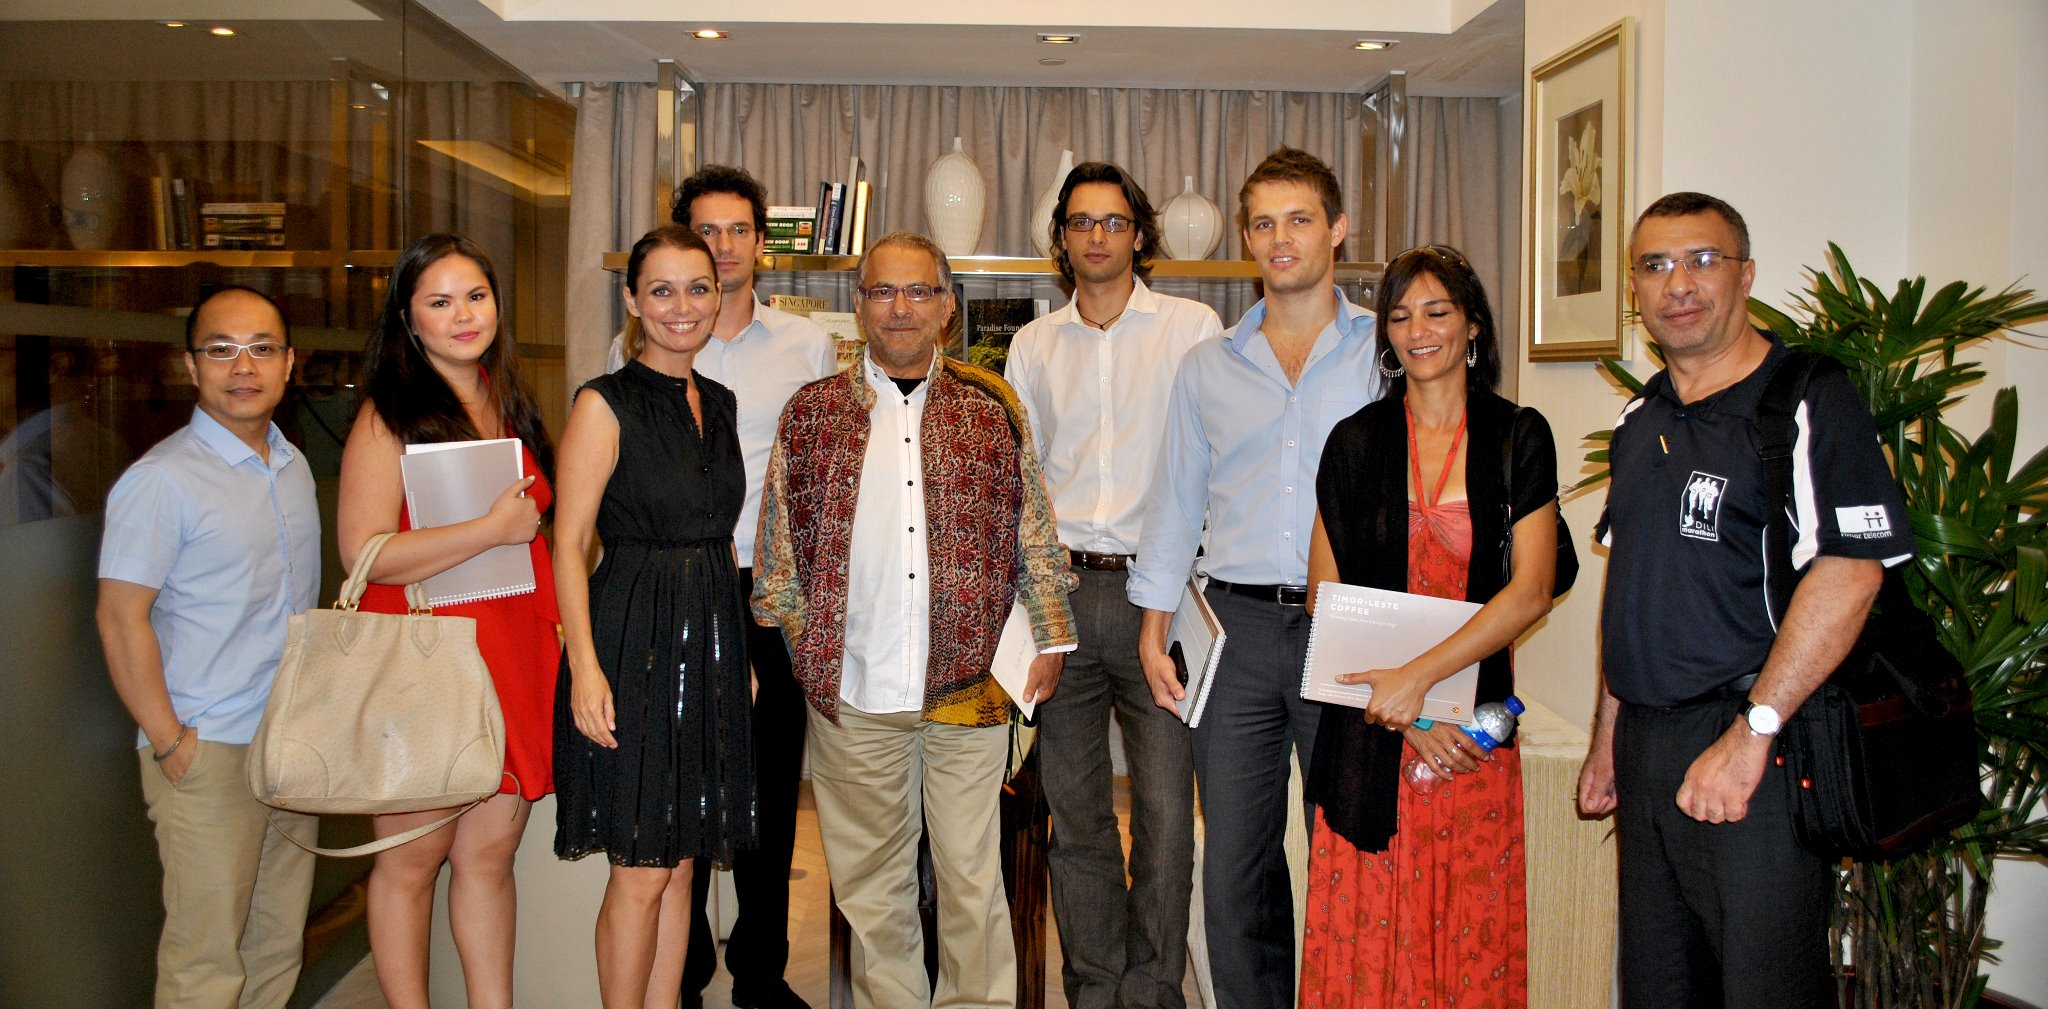 The Cafe Timor-Leste volunteer team - from Left - Allan Agustin, Unknown, Kristine Oustrup Laureijs, Nils Van Wassenhove, H.E. Jose Ramos-Horta, Christophe Delacroix, Henrik Meltesen, Heena Patel, Unknown